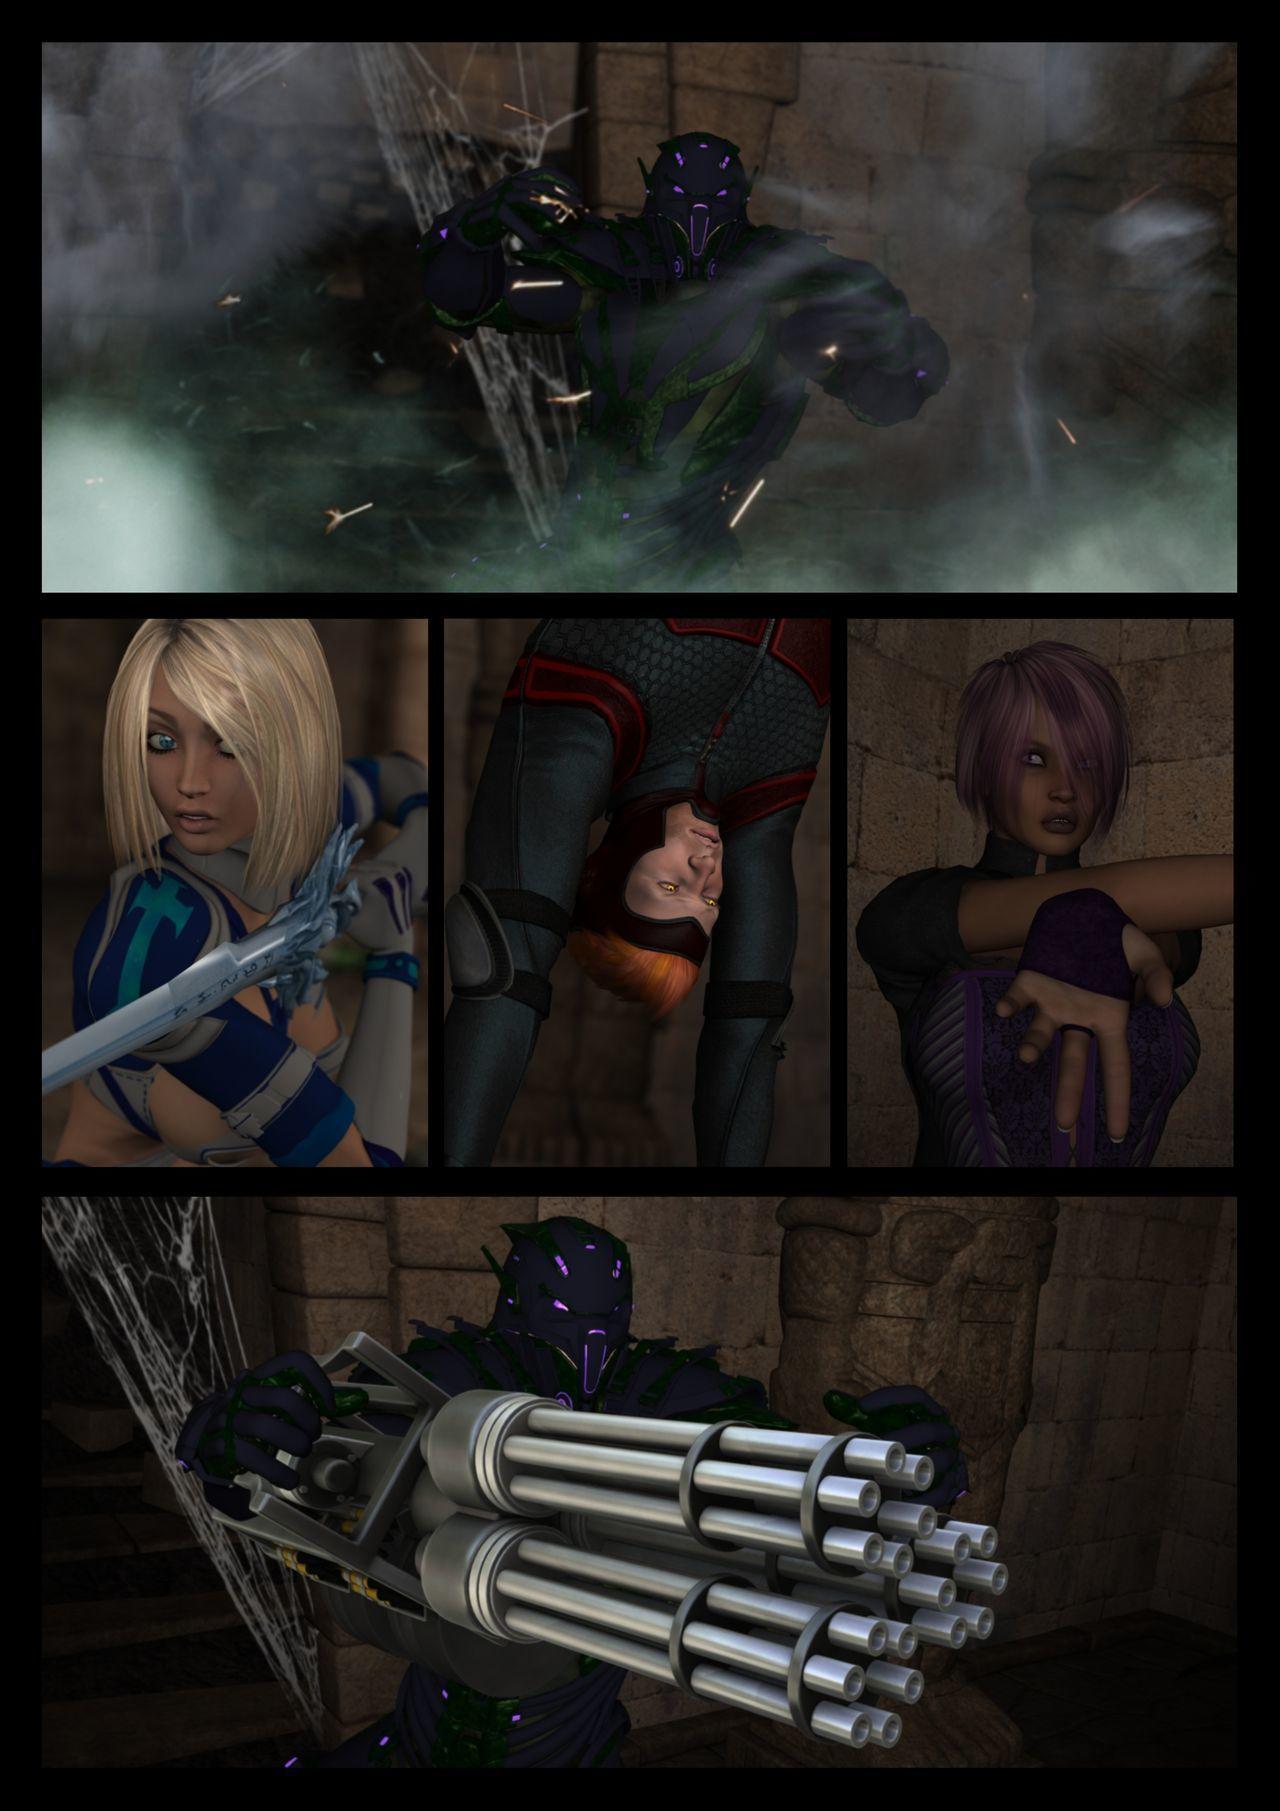 [Shinra-kun] Legion: Thrall of the Mask - Part 1 - part 2